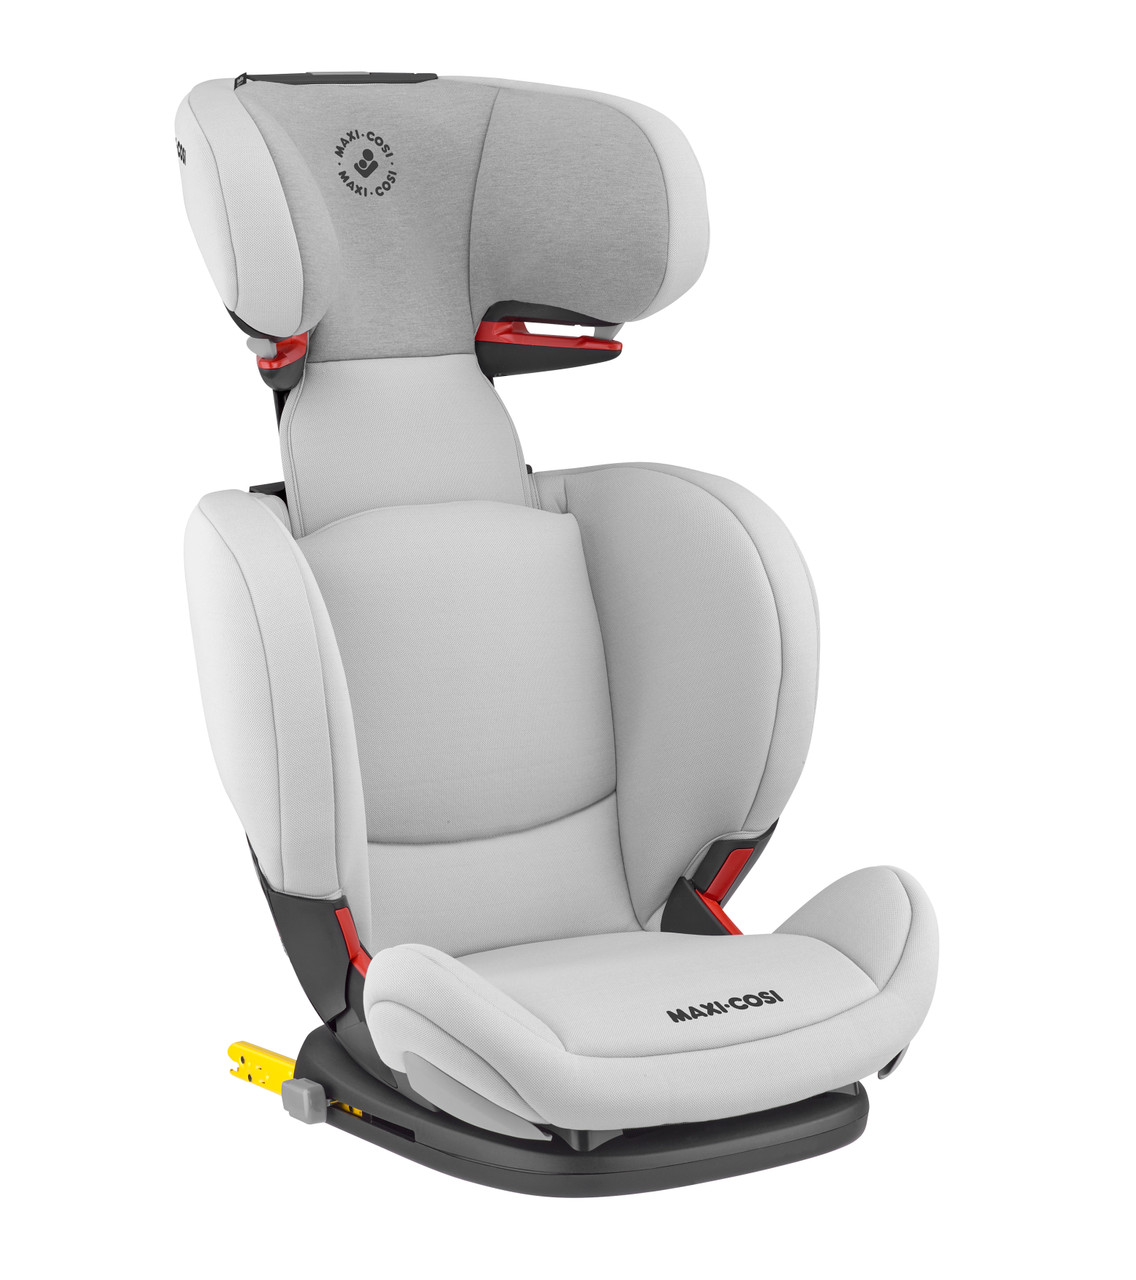 maxi cosi rodifix air protect car seat. Black Bedroom Furniture Sets. Home Design Ideas